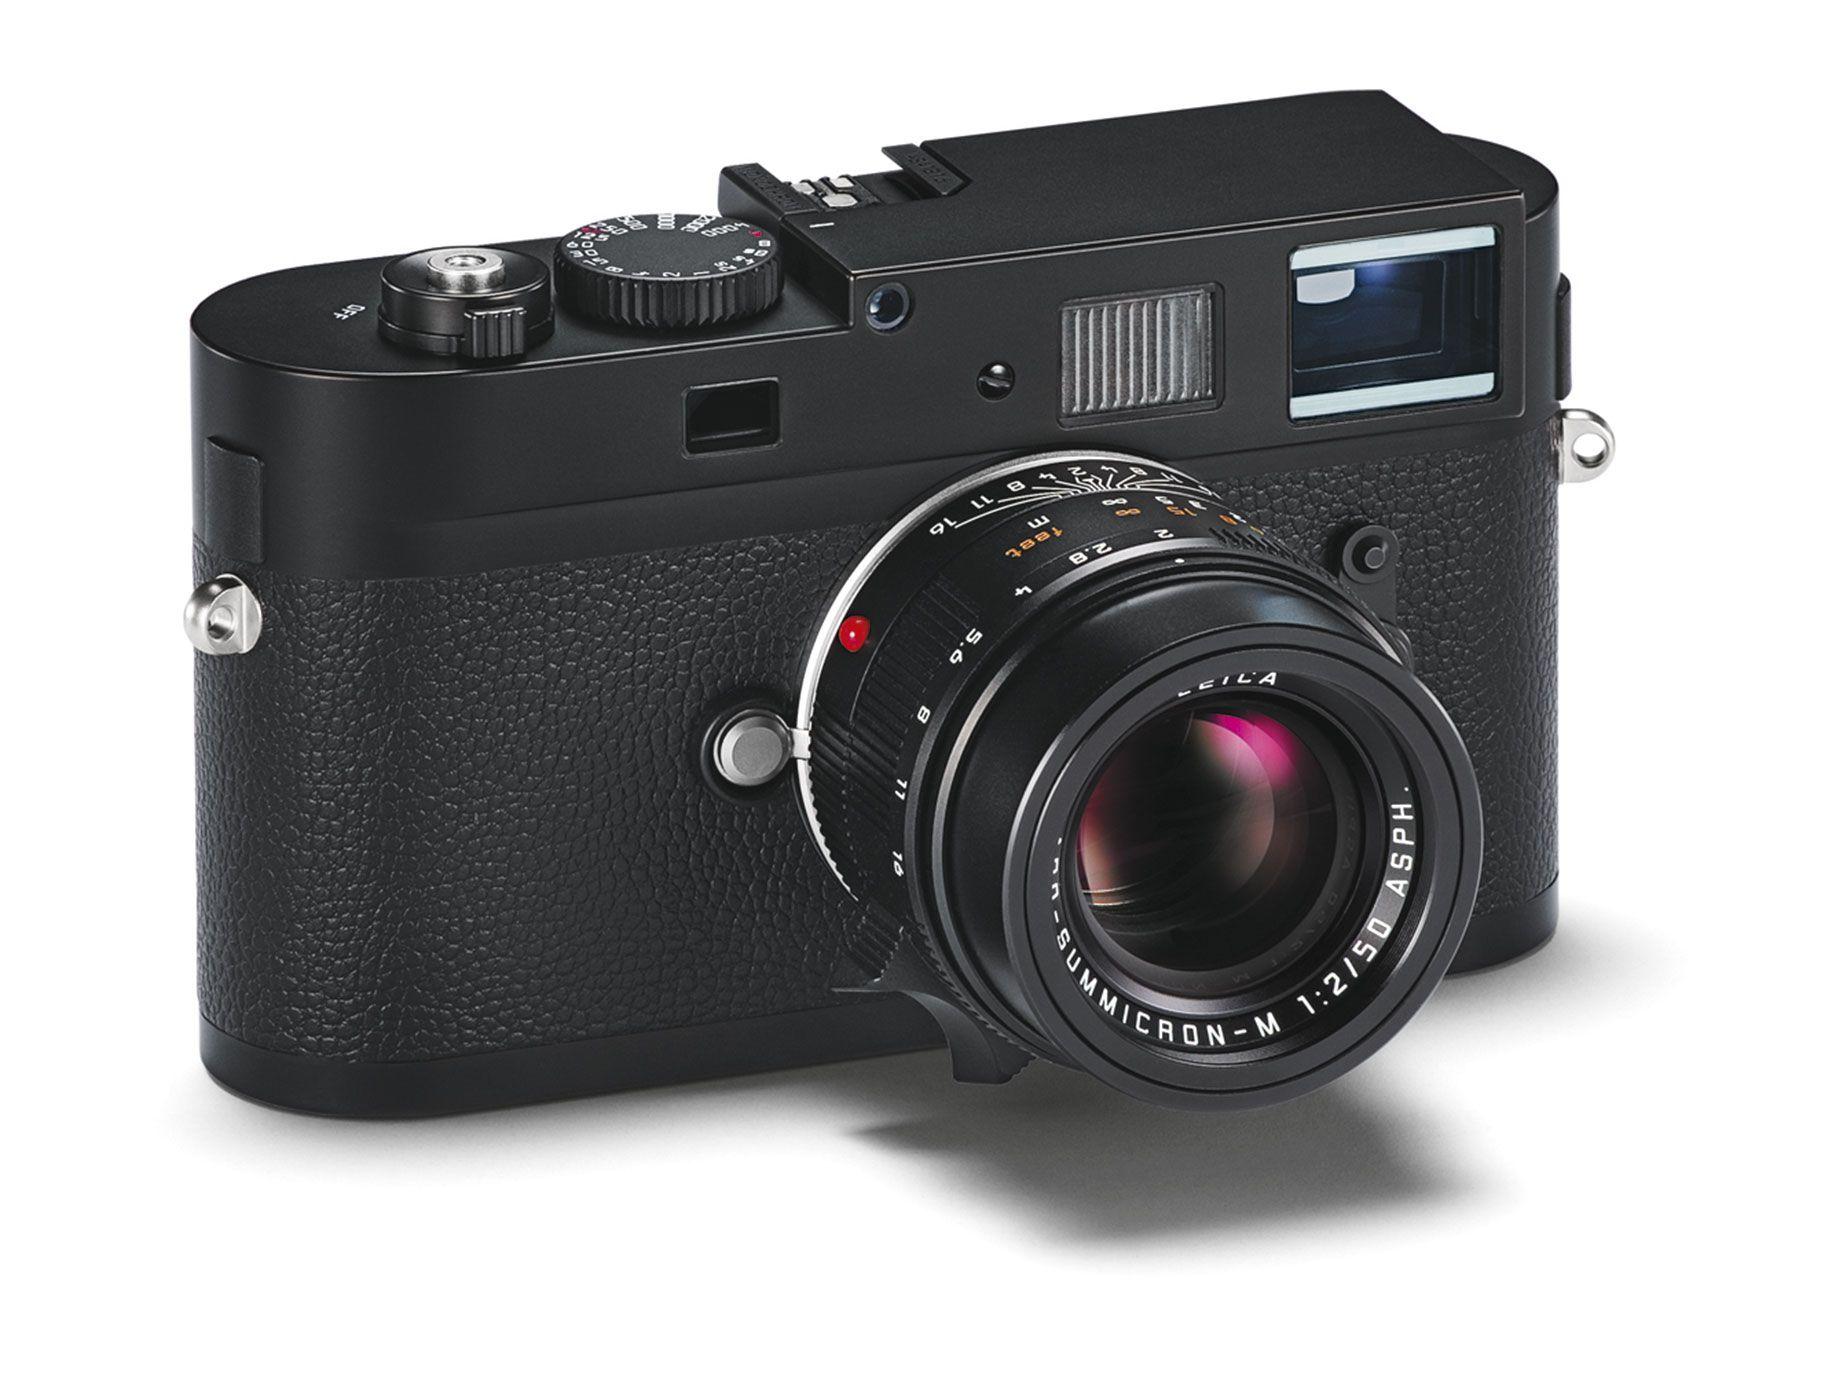 Leica M Monochrom Type 246, $7,450